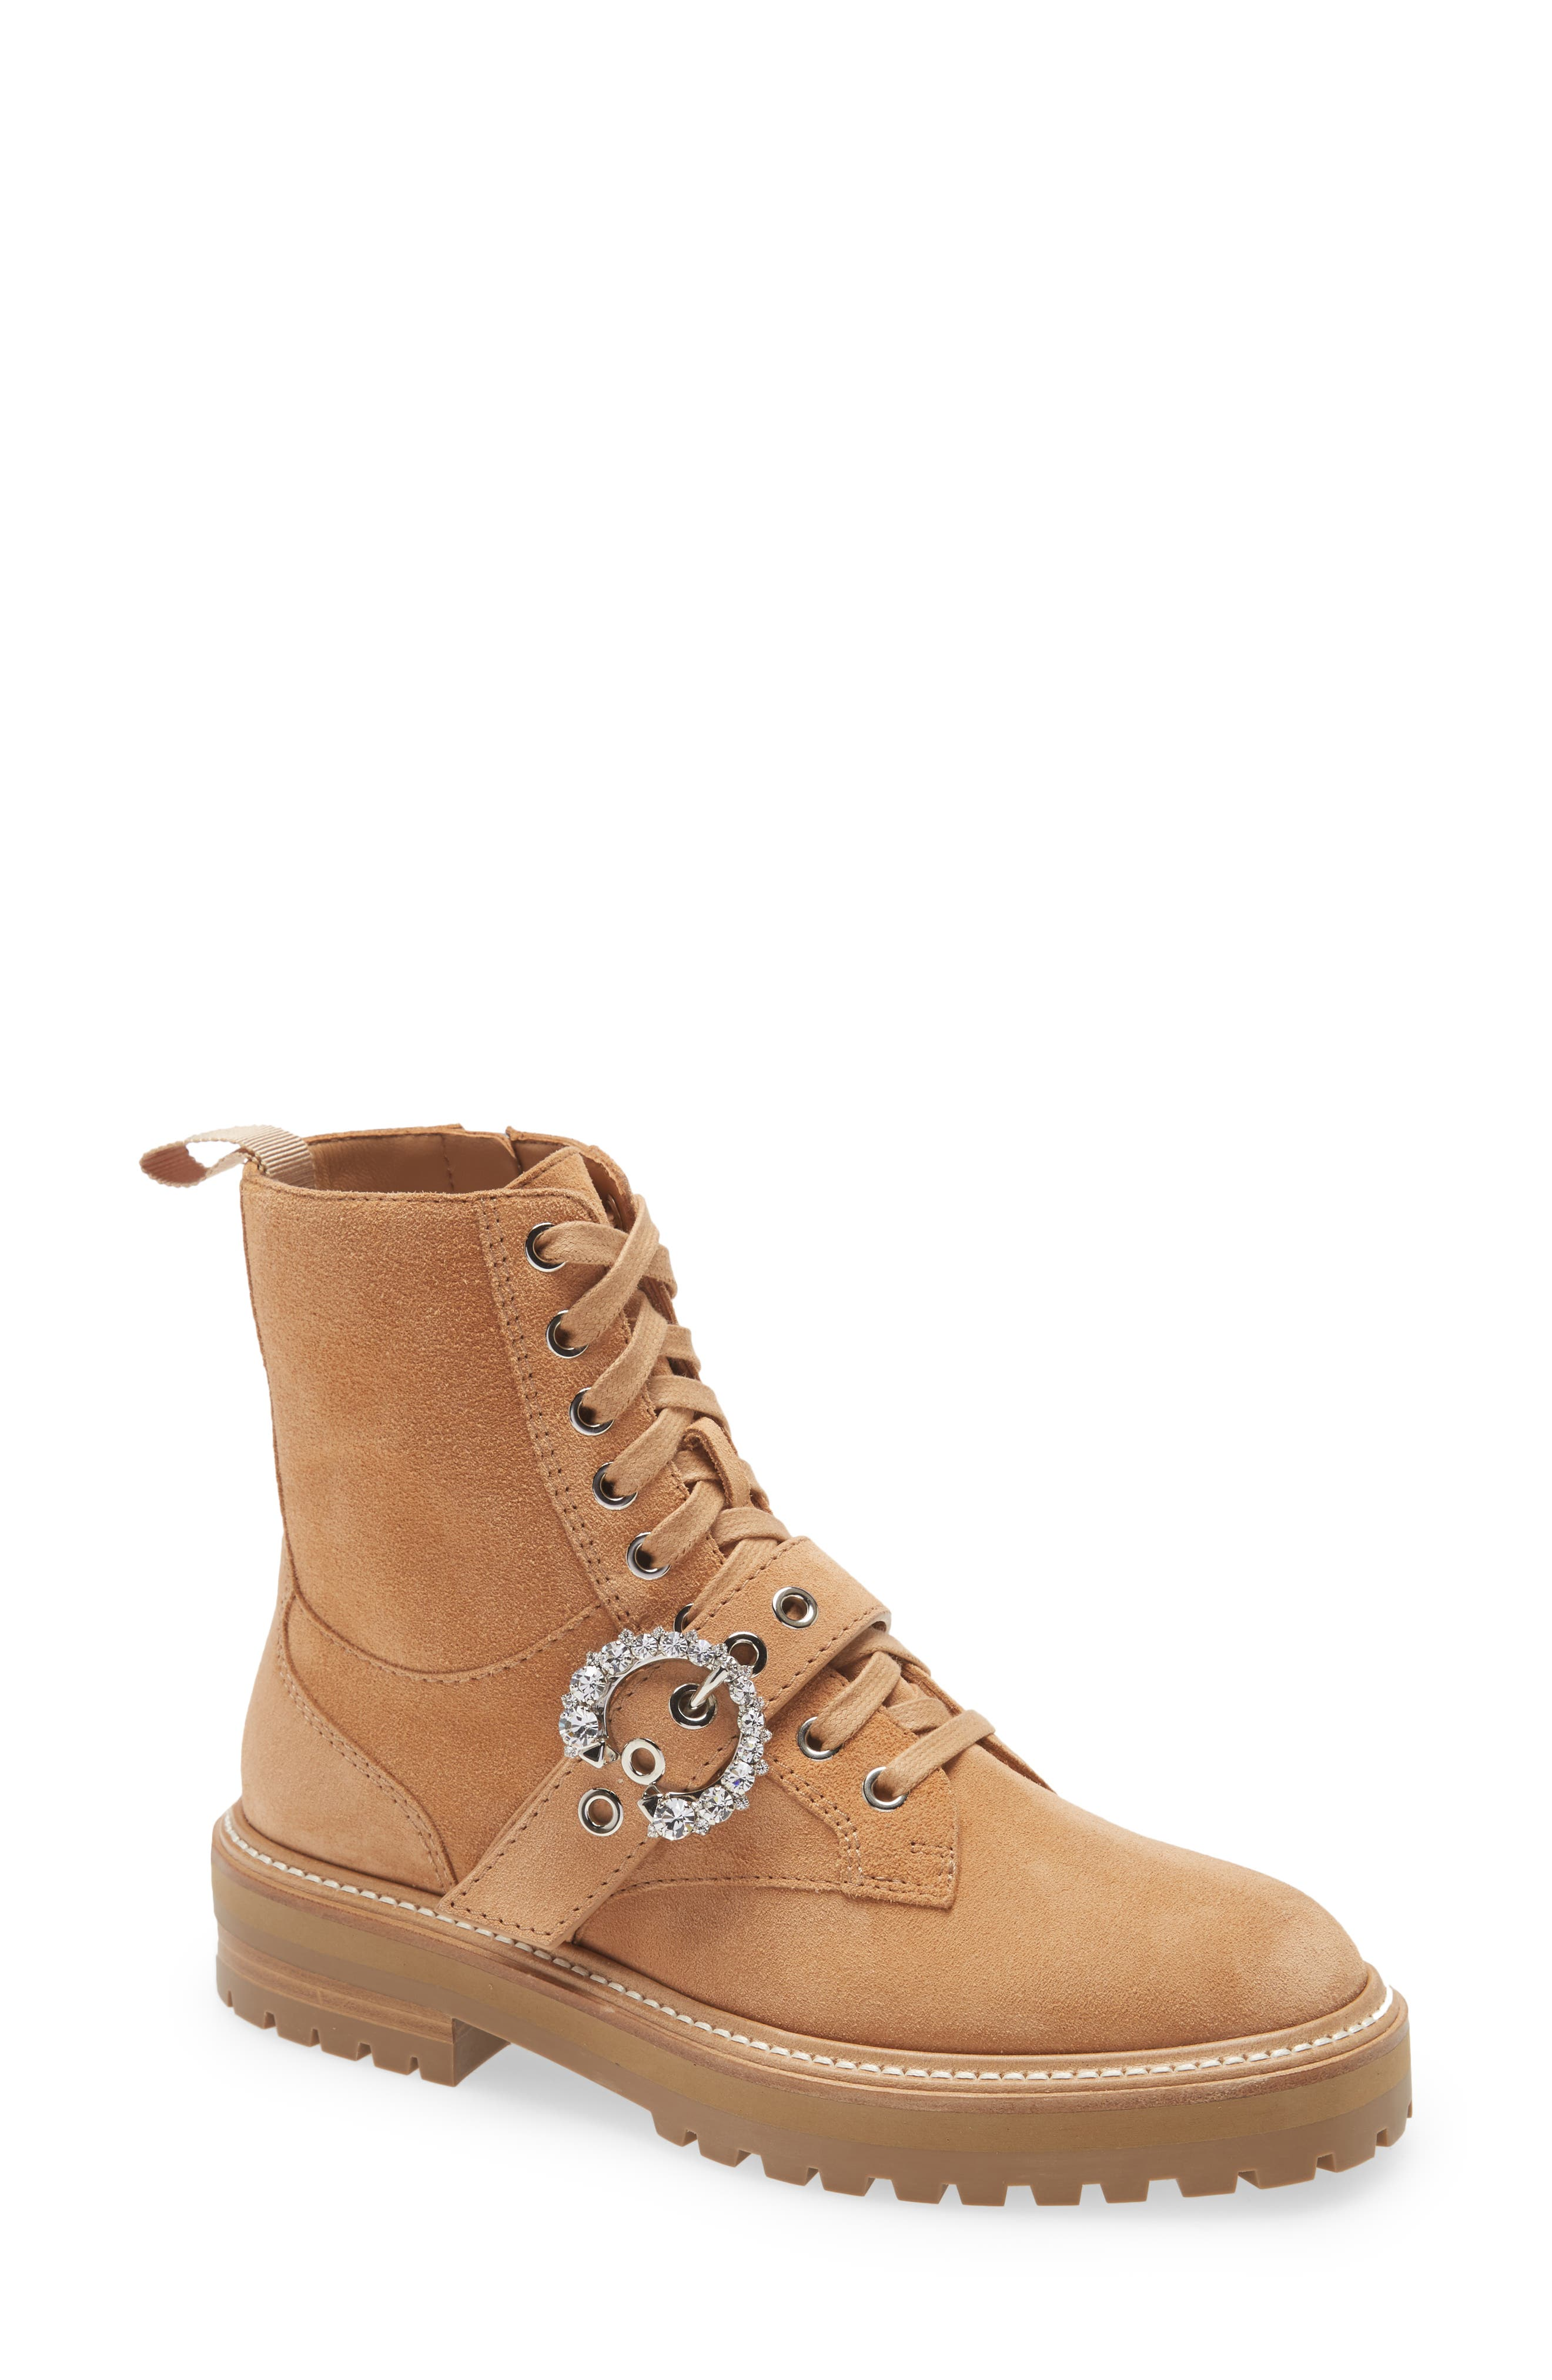 Women's Jimmy Choo Cora Crystal Buckle Combat Boot